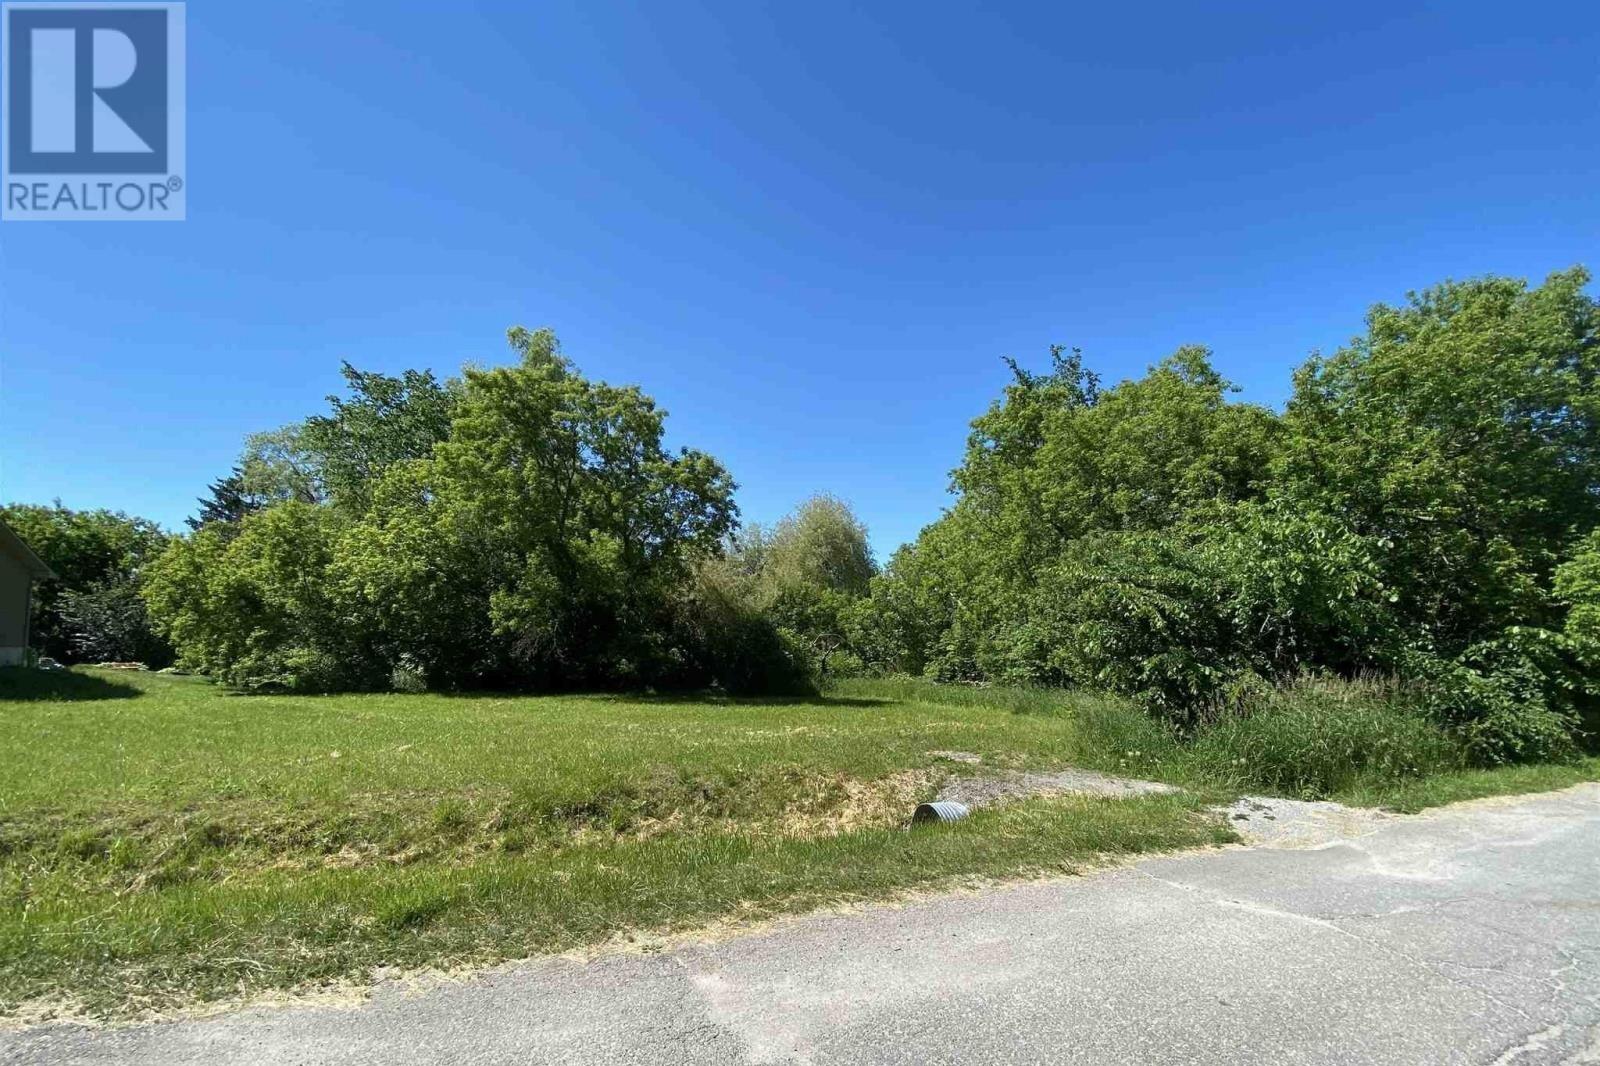 Residential property for sale at 14 Whelan St Westport Ontario - MLS: K20006130a